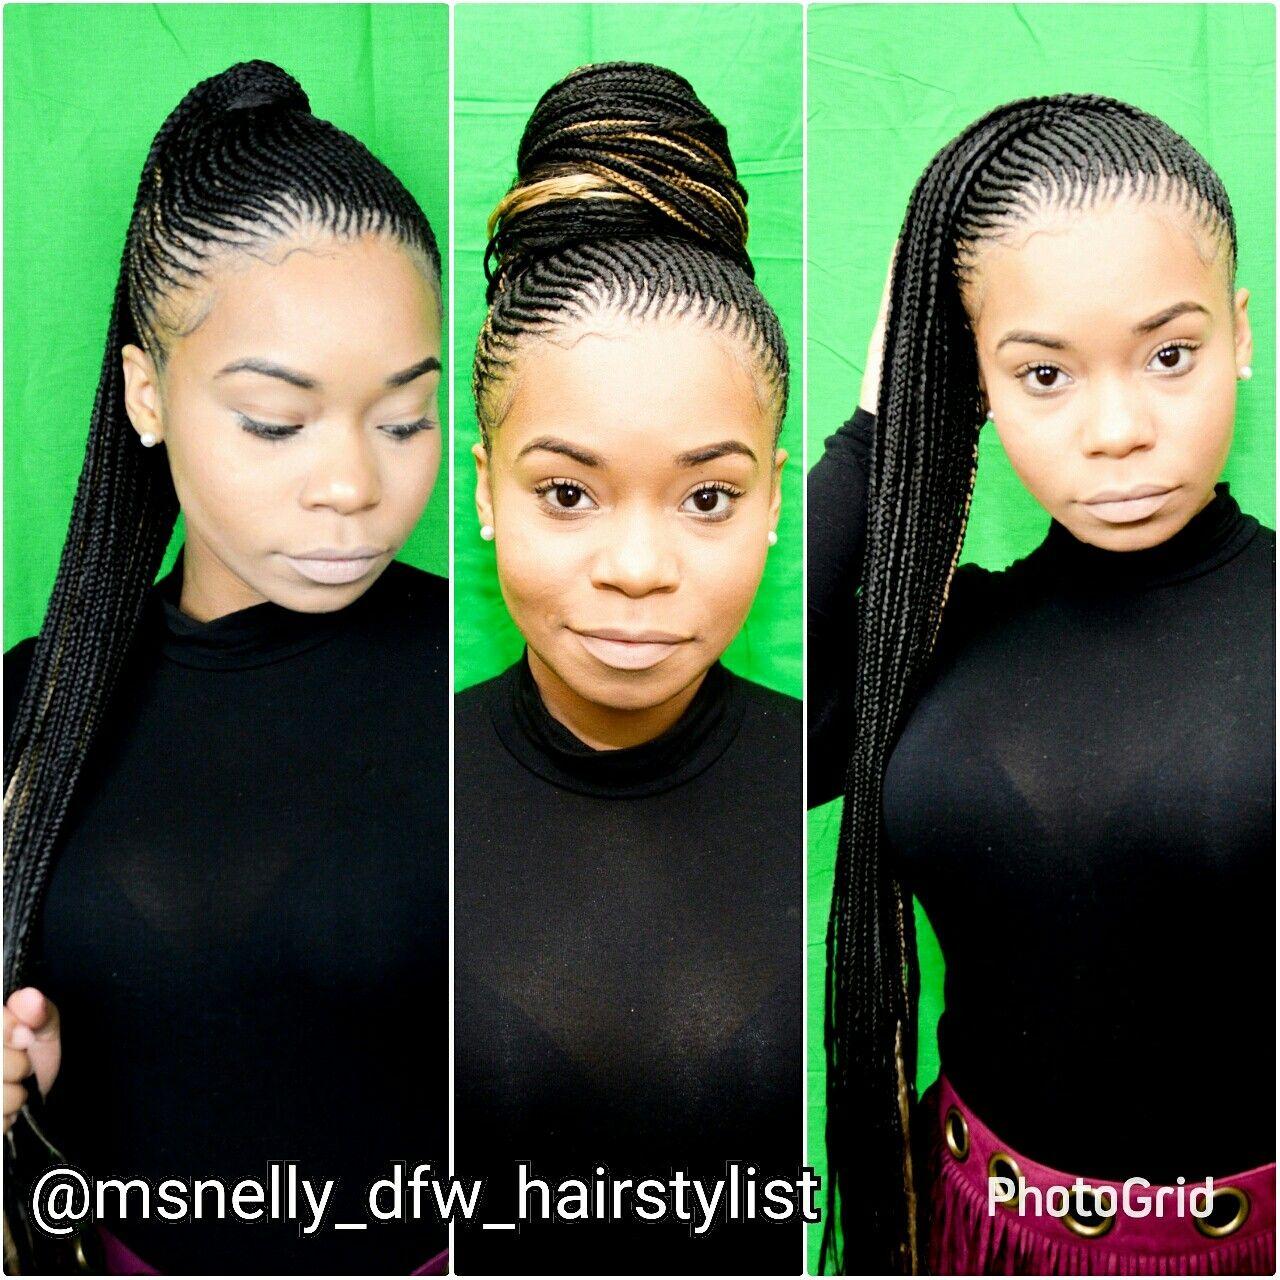 Nicki Minaj Braids Feedin Braids Feeder Braids Small Cornrow Ponytail Cornrow Ponytail Hair Styles Nicki Minaj Braids